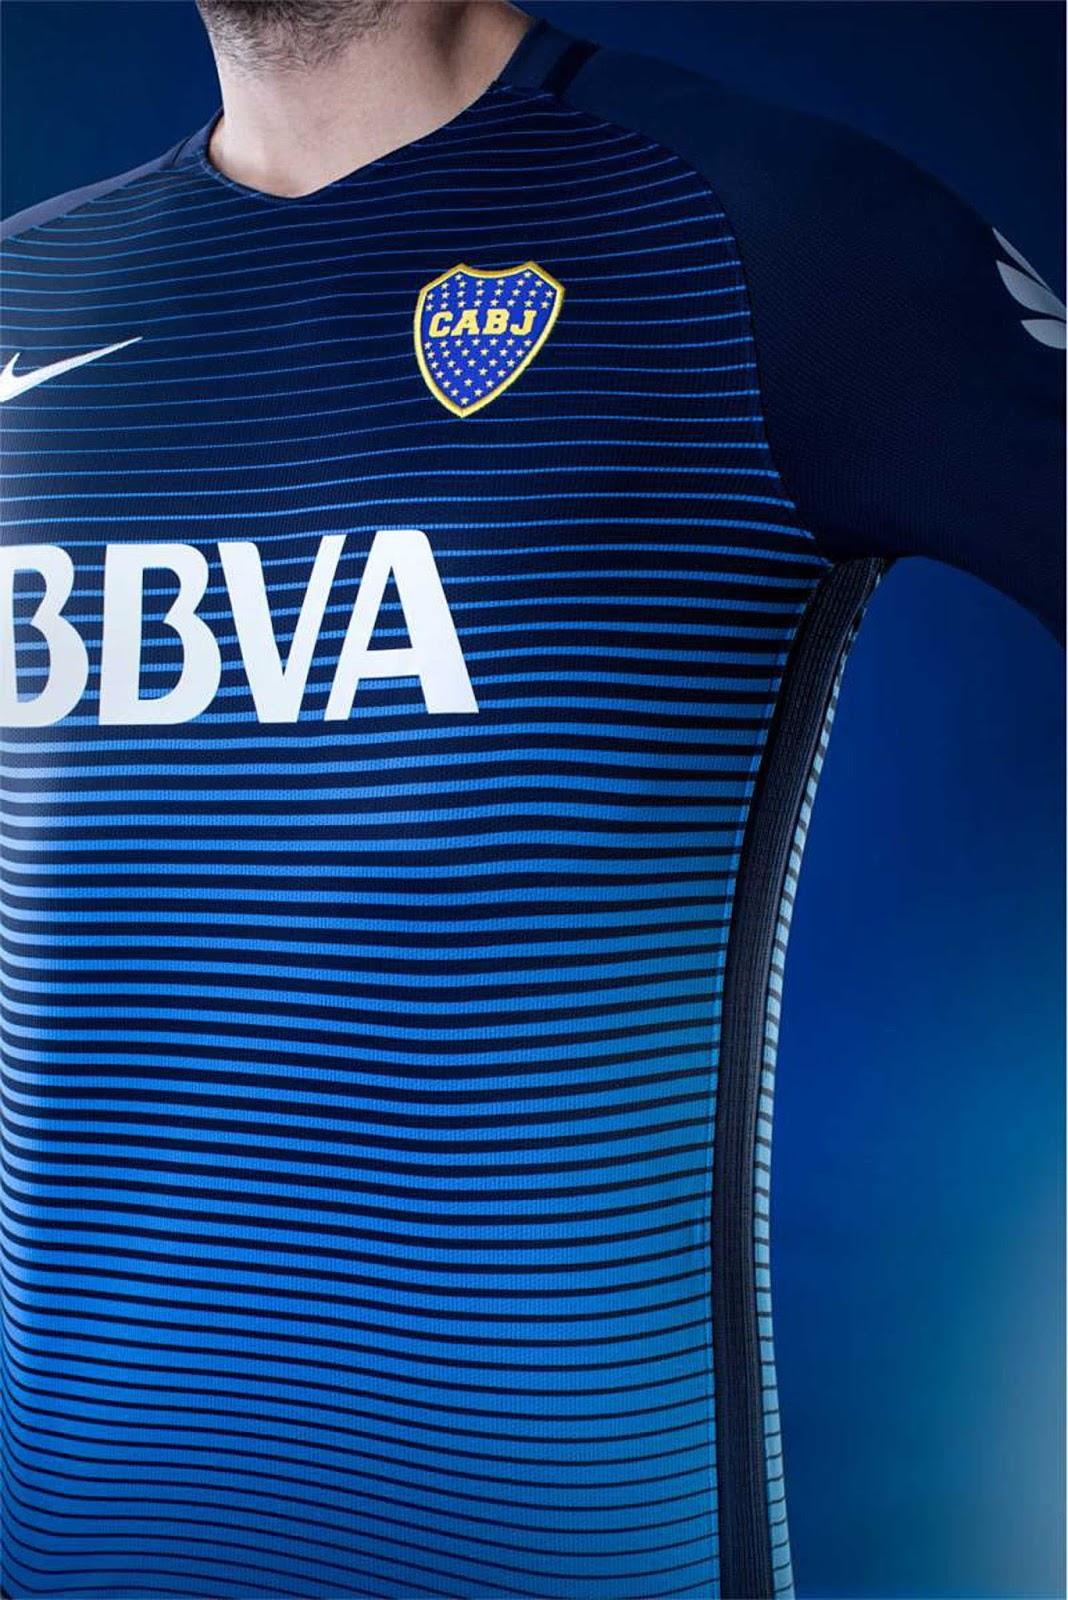 2017506c79b42 Boca presentó su nueva camiseta alternativa para el 2017 - Notimix